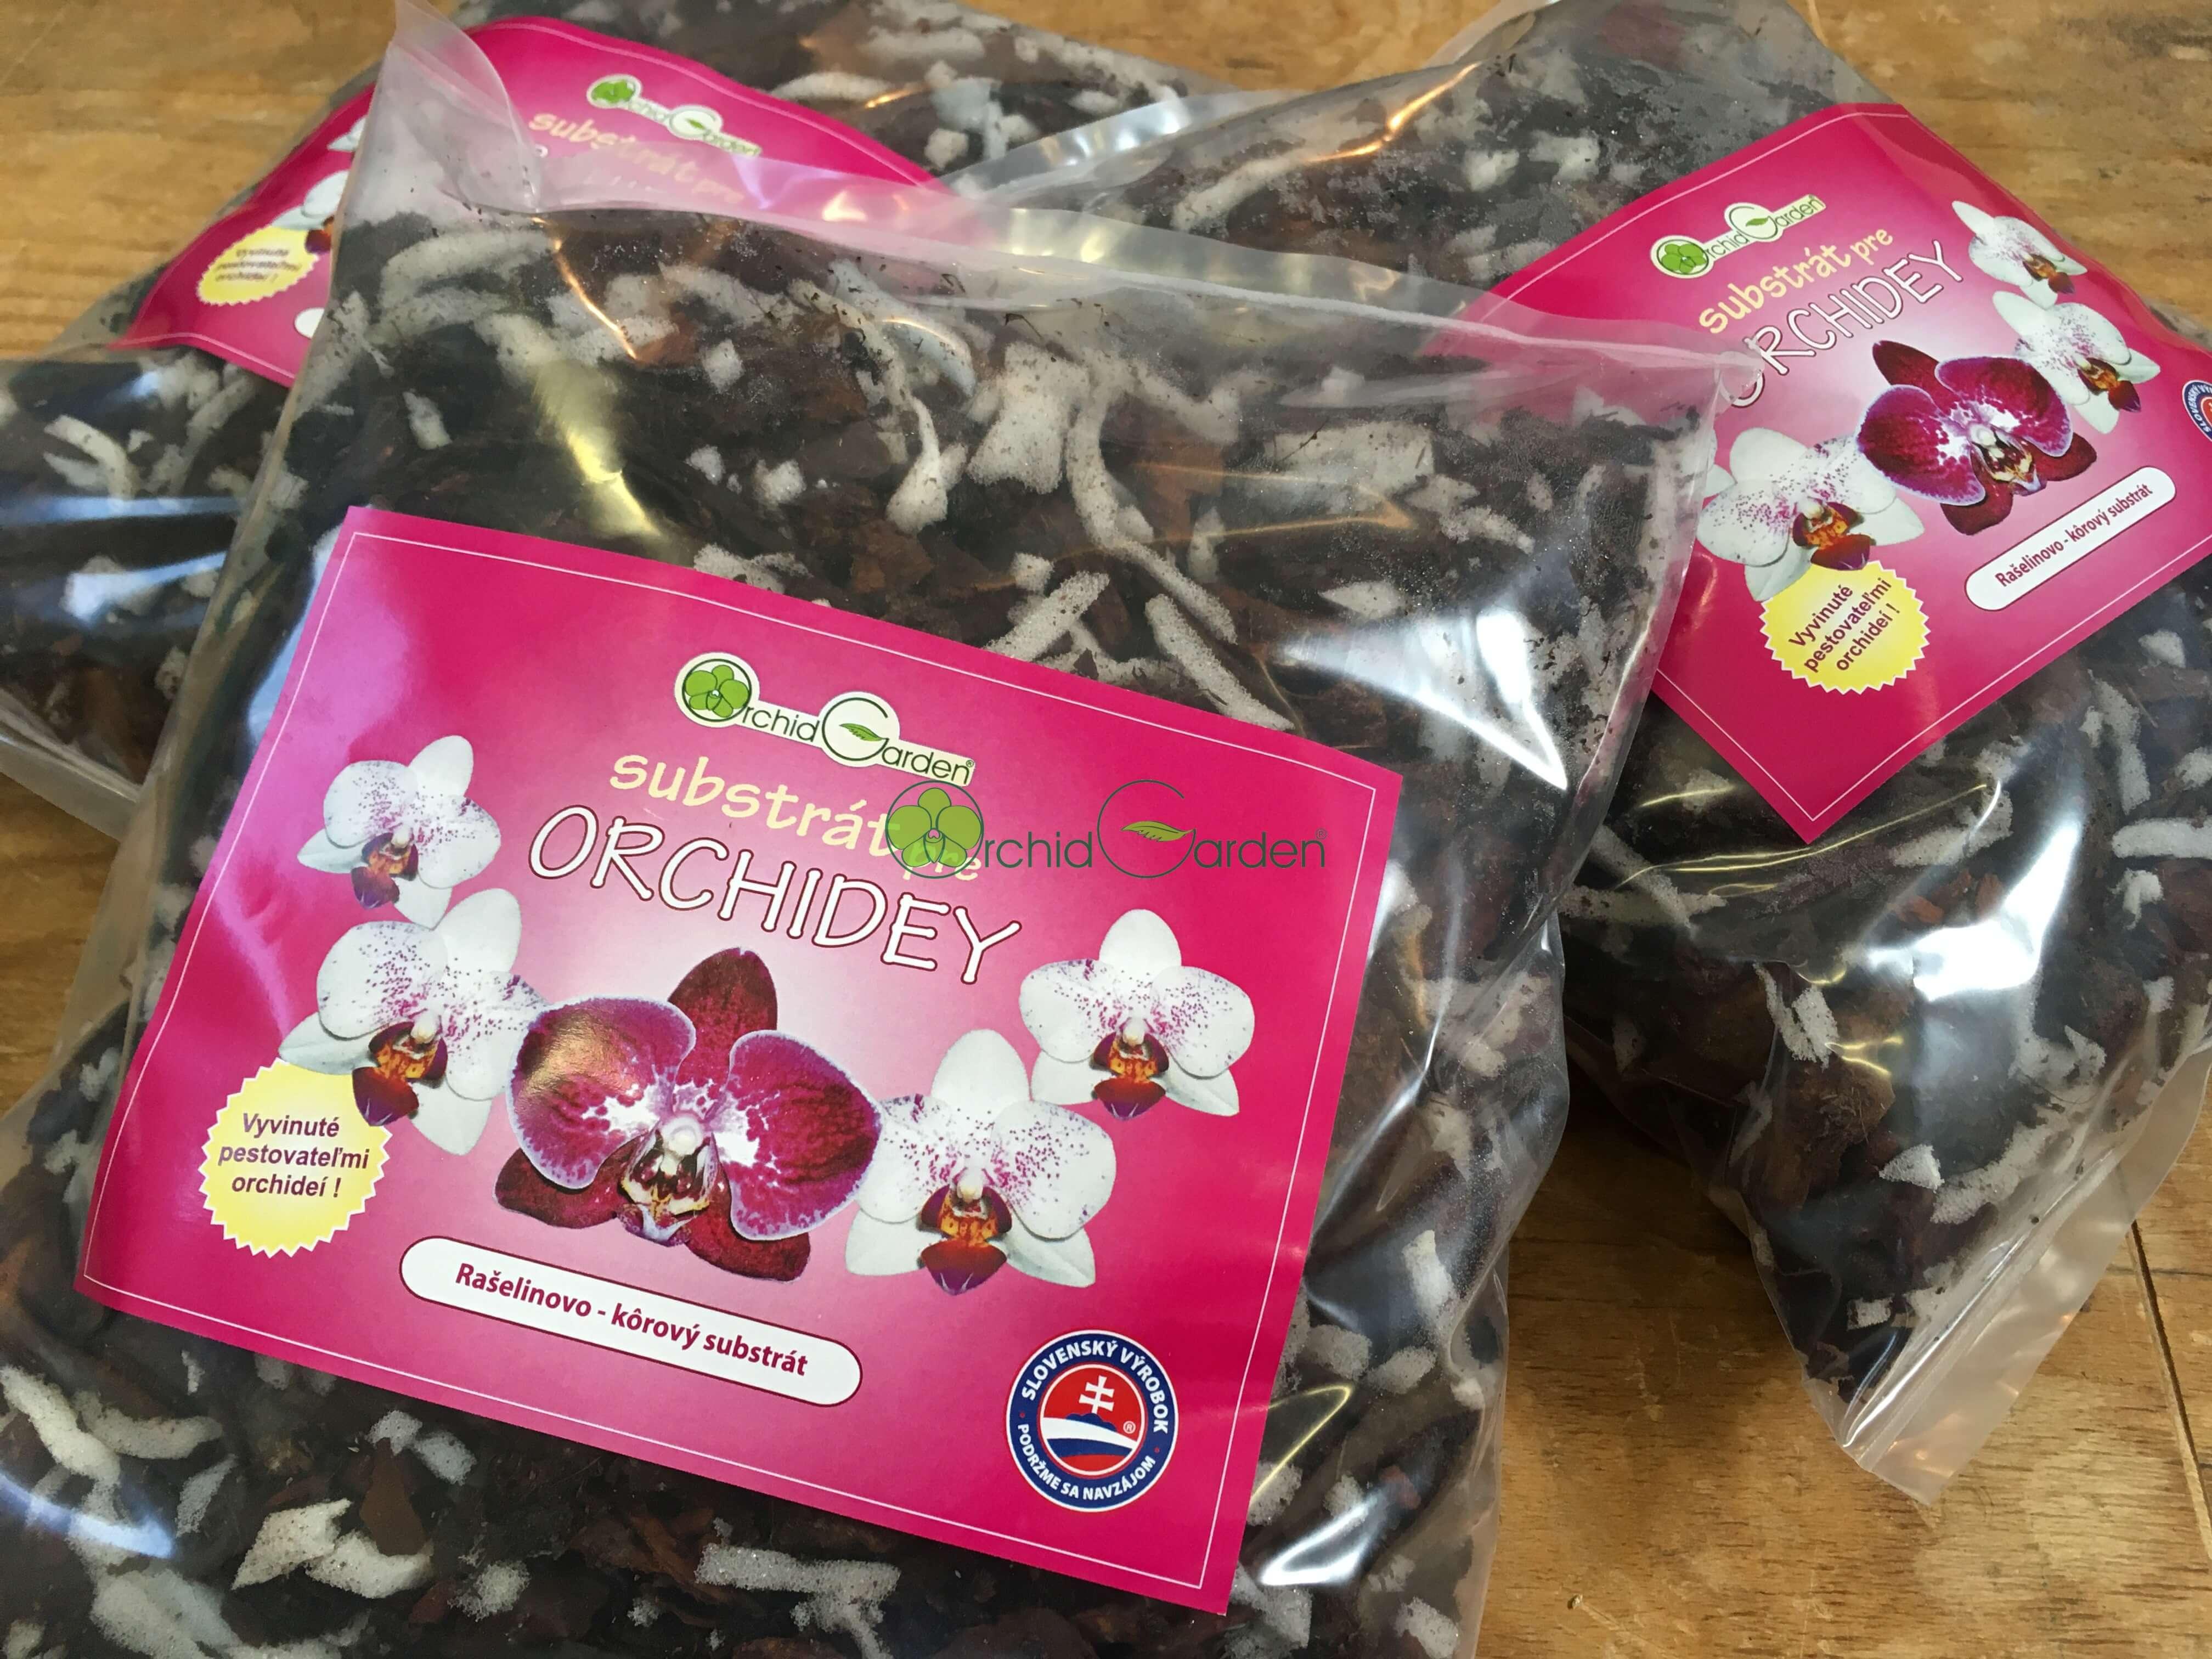 Substrát pre orchidey od Orchidgarden